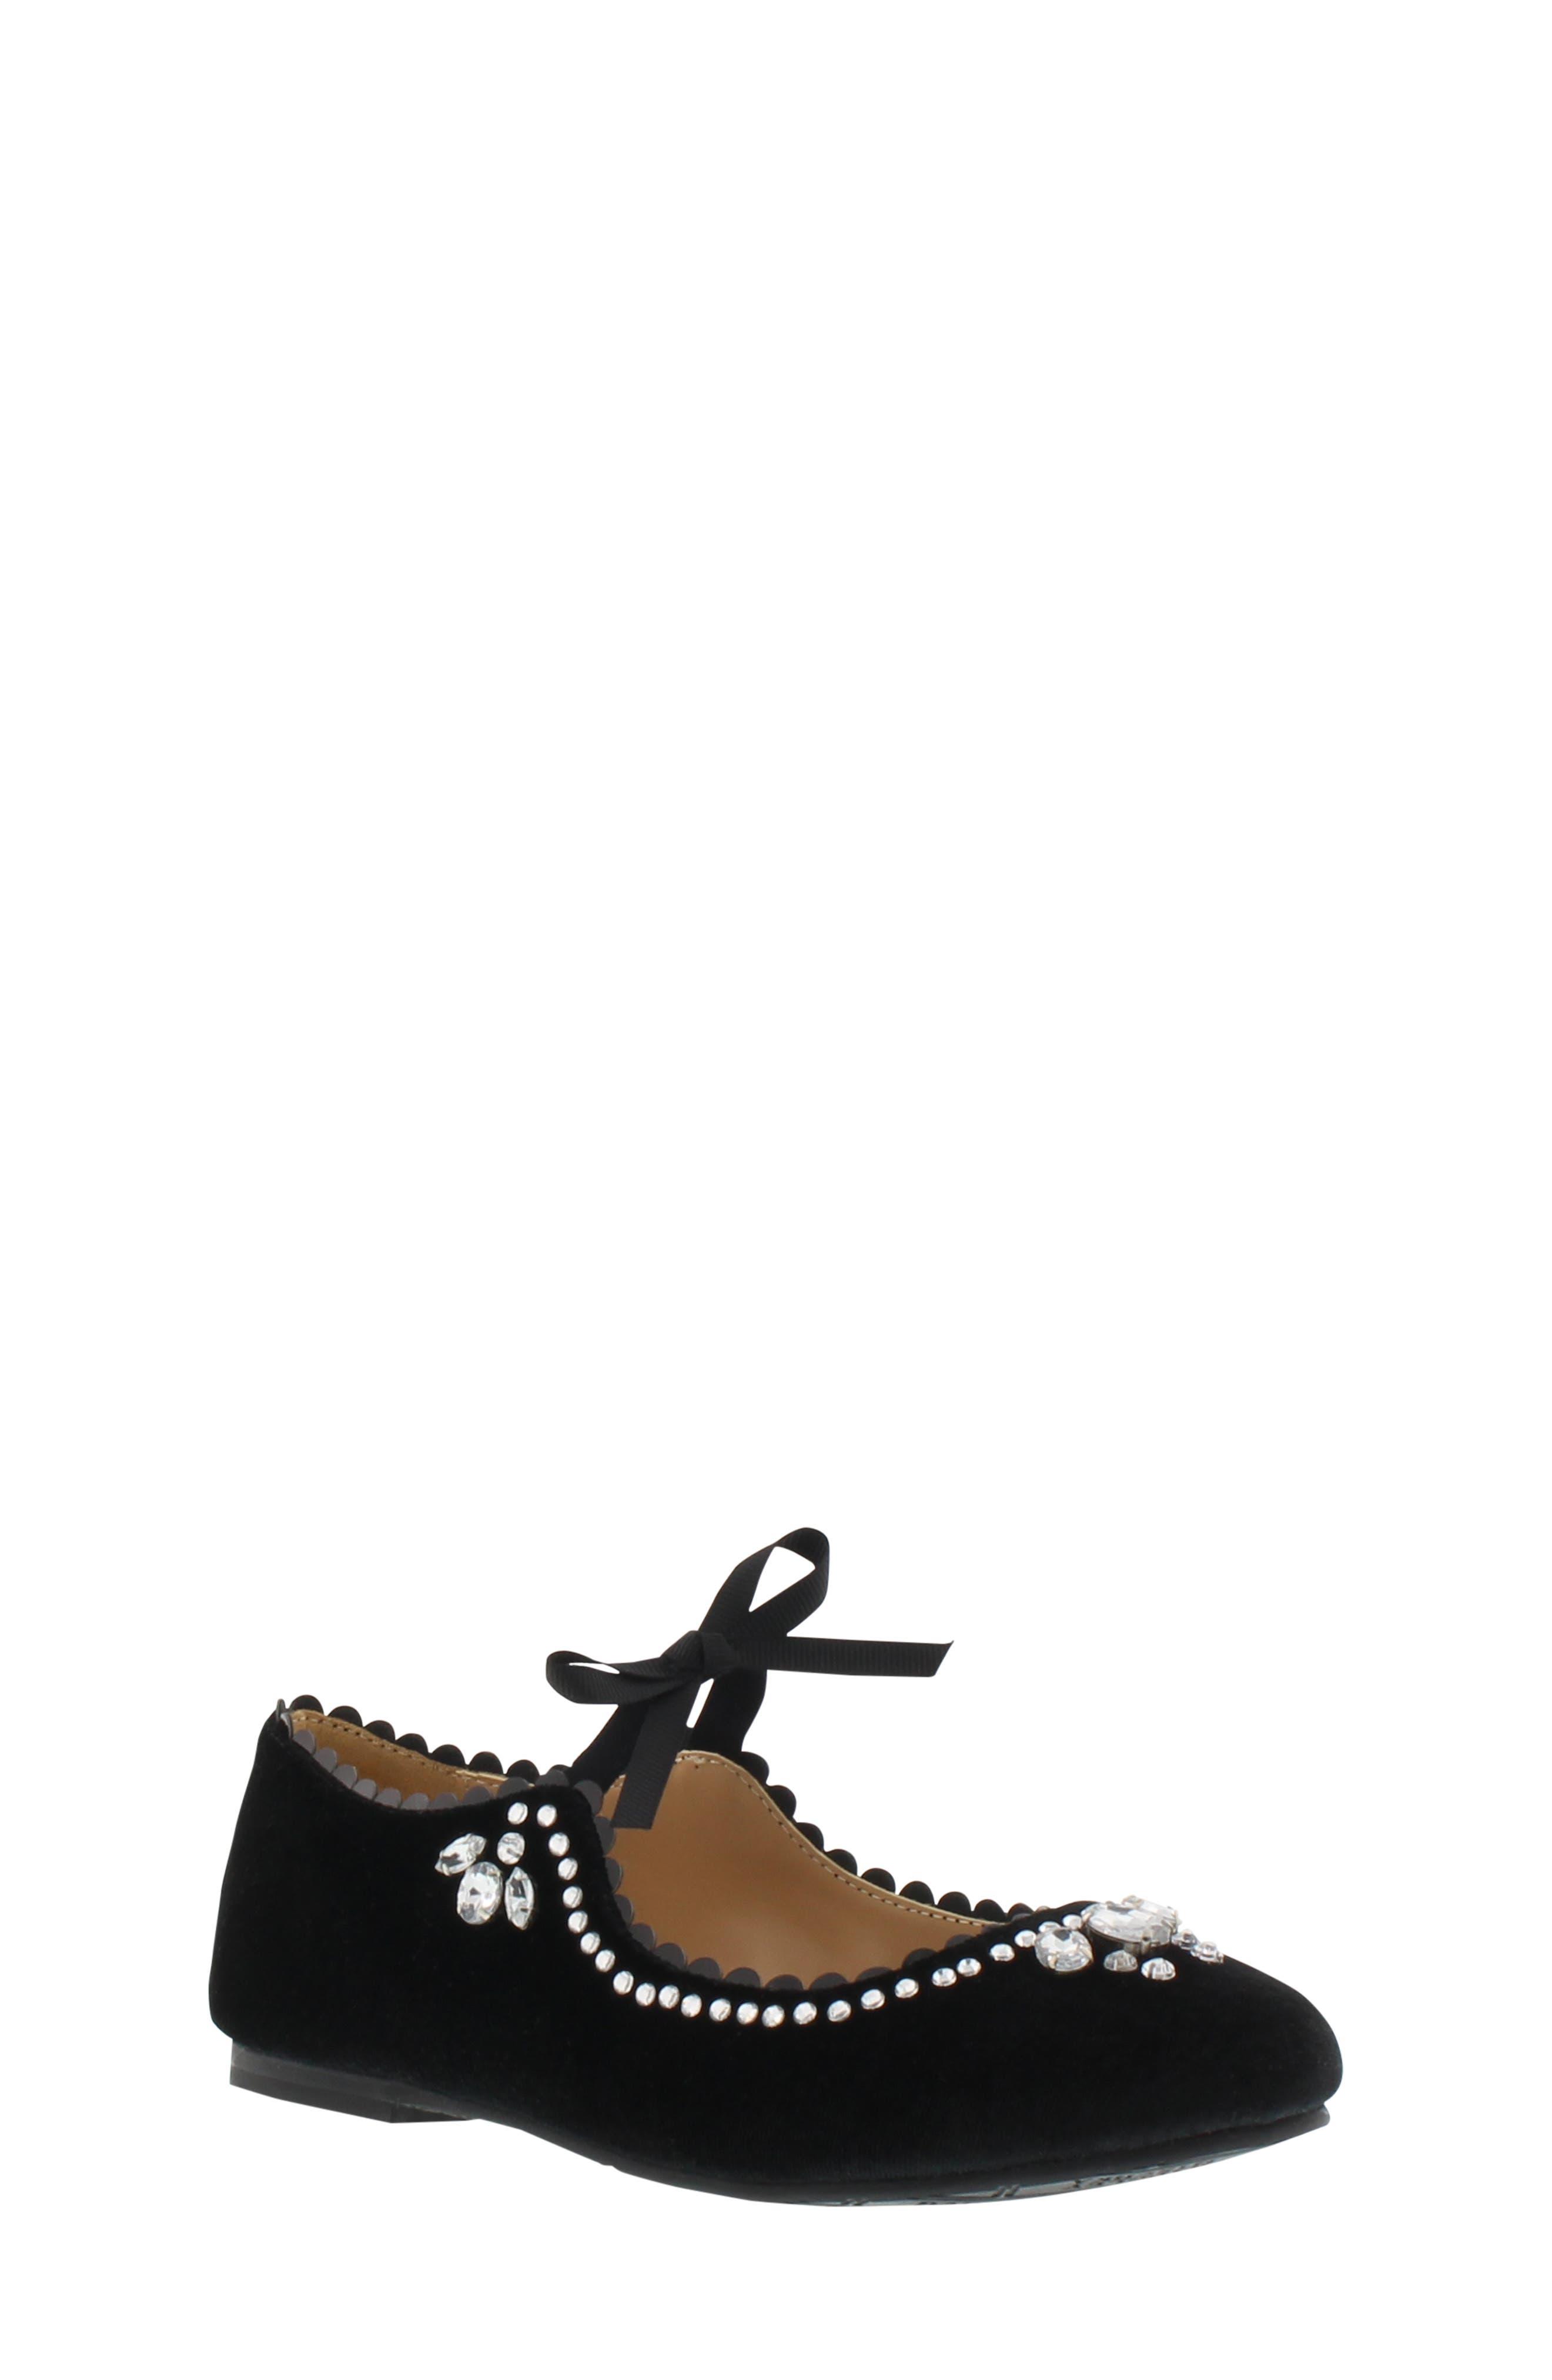 Badgley Mischka Amber Scallop Embellished Flat,                             Main thumbnail 1, color,                             BLACK